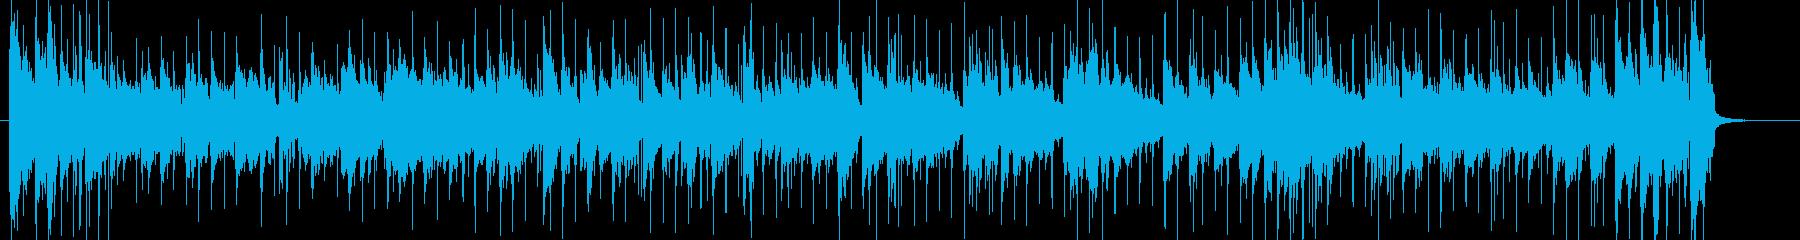 70'sニューミュージックボサノバSH版の再生済みの波形